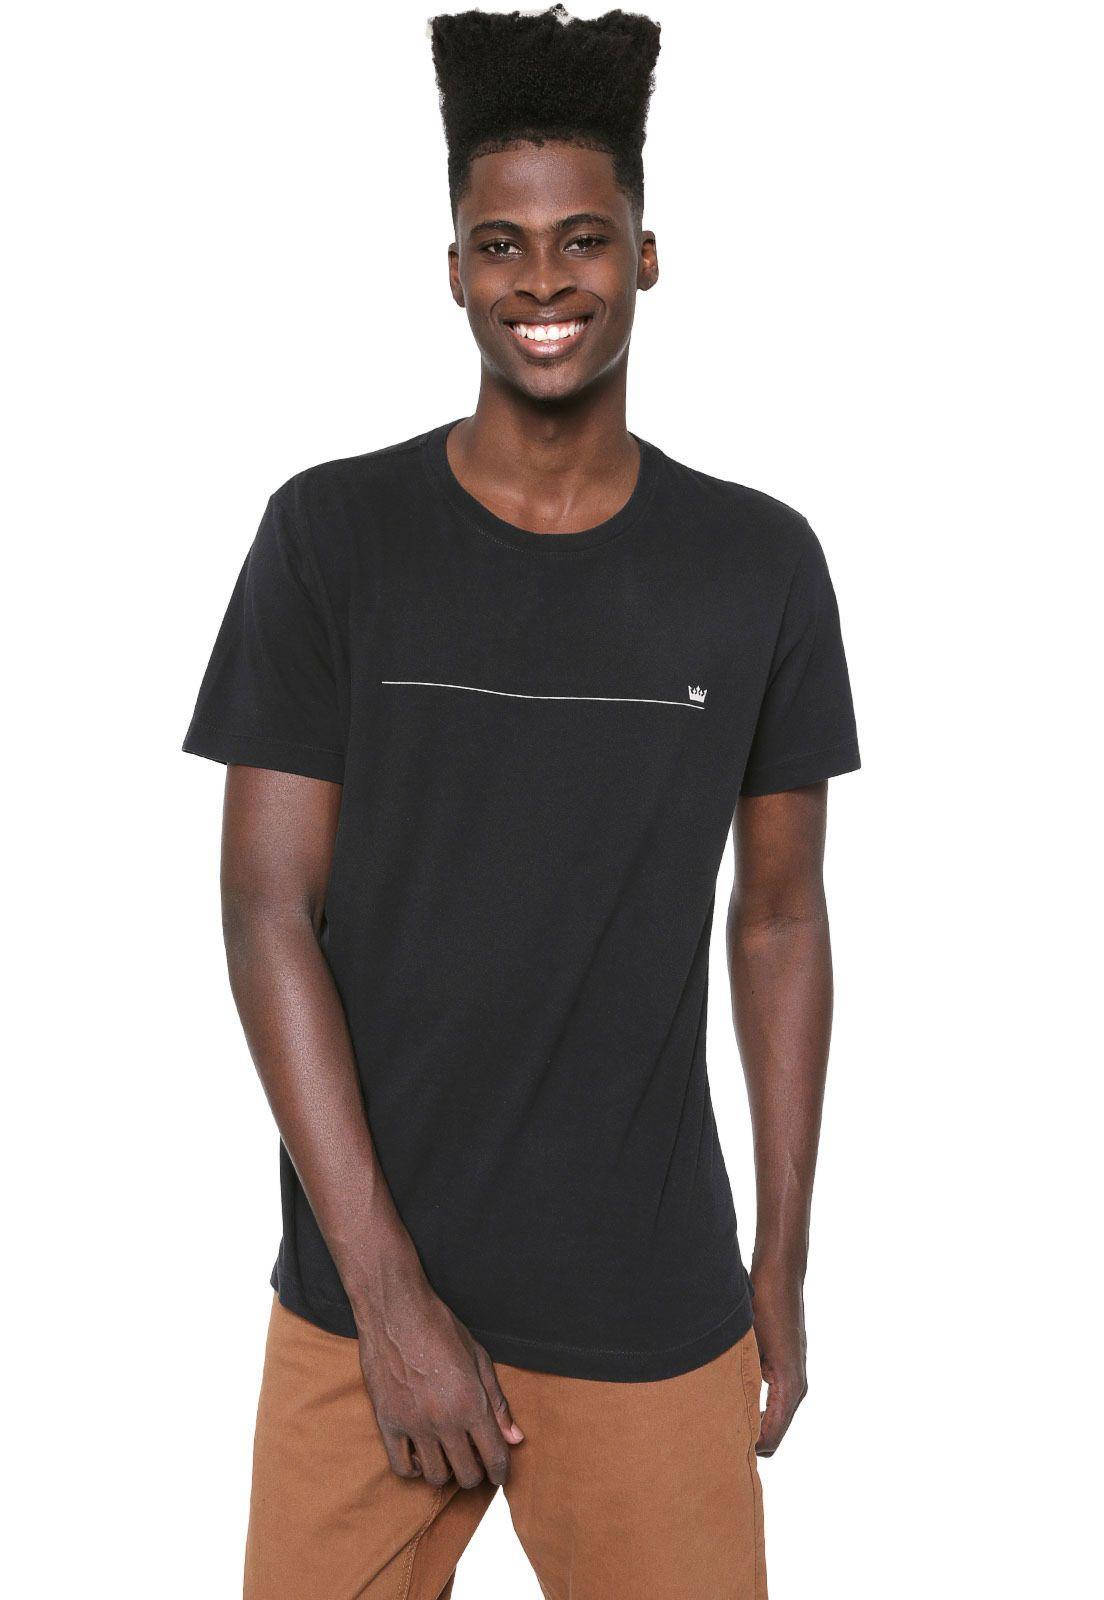 Camiseta Osklen Color Minim Preta | Camiseta osklen, Osklen